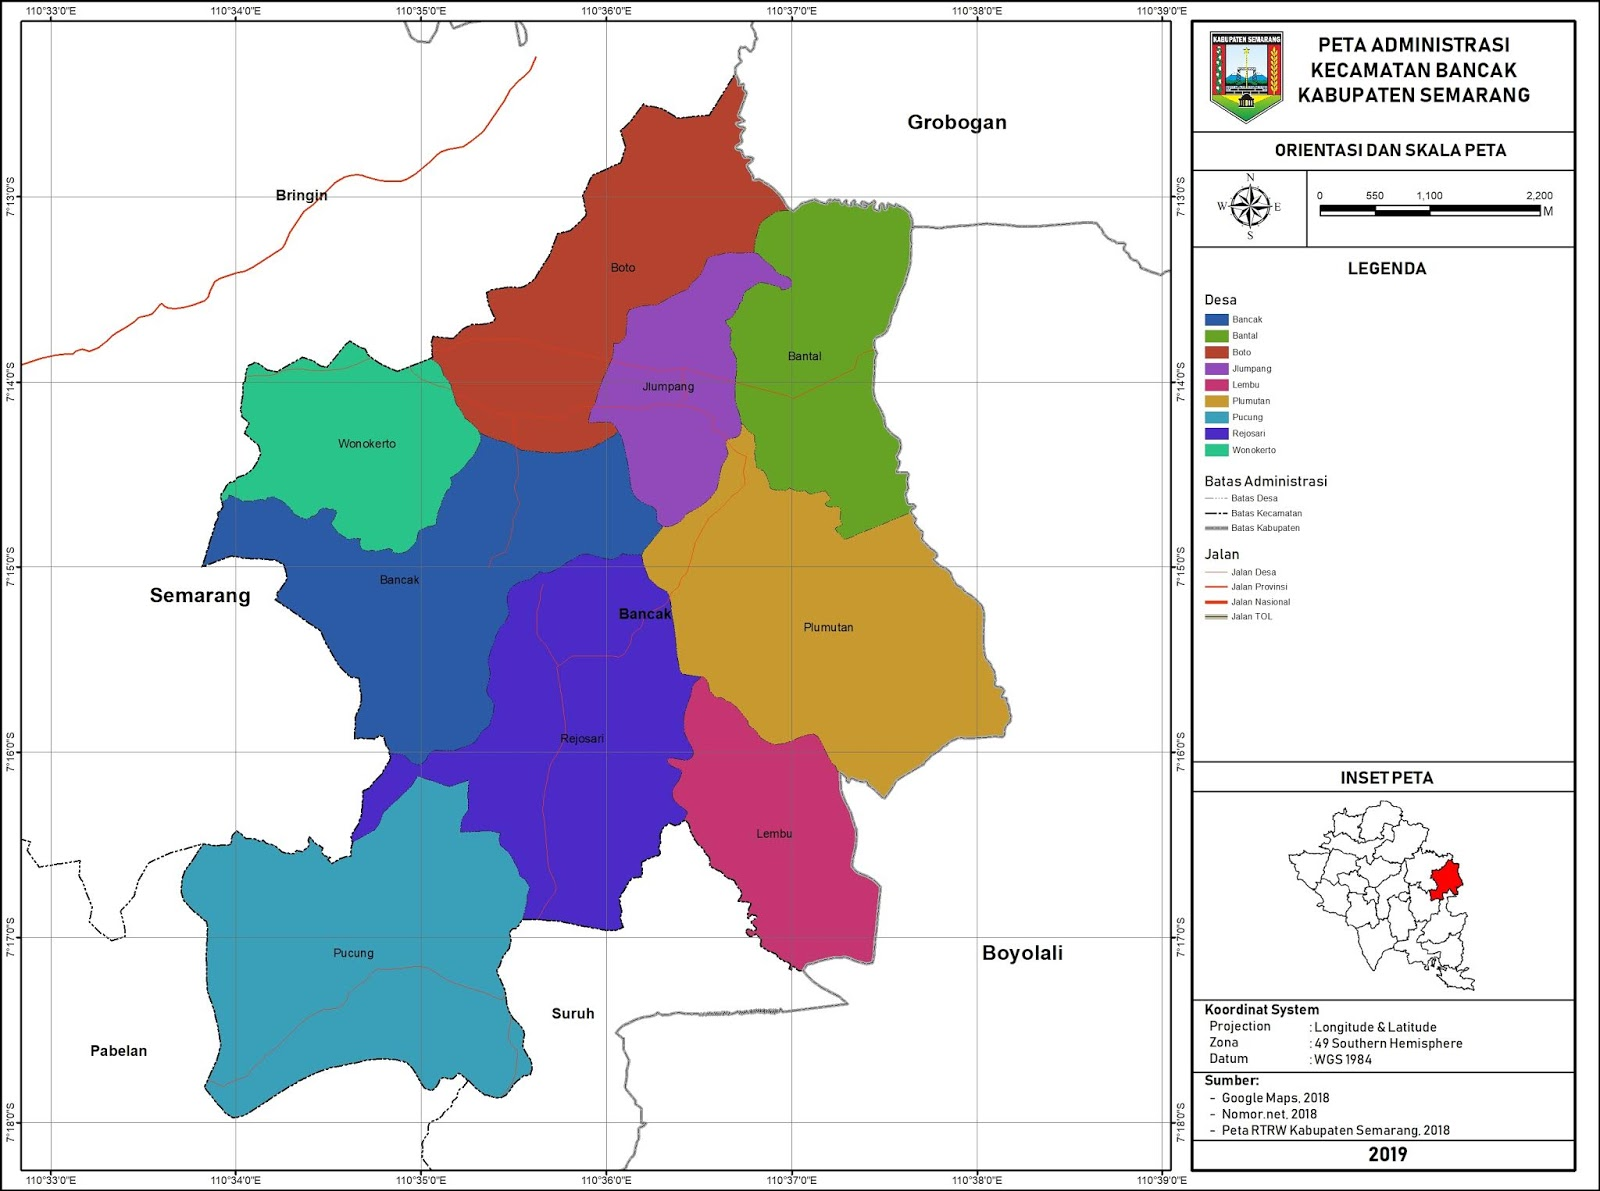 Peta Administrasi Kecamatan Bancak, Kabupaten Semarang ...